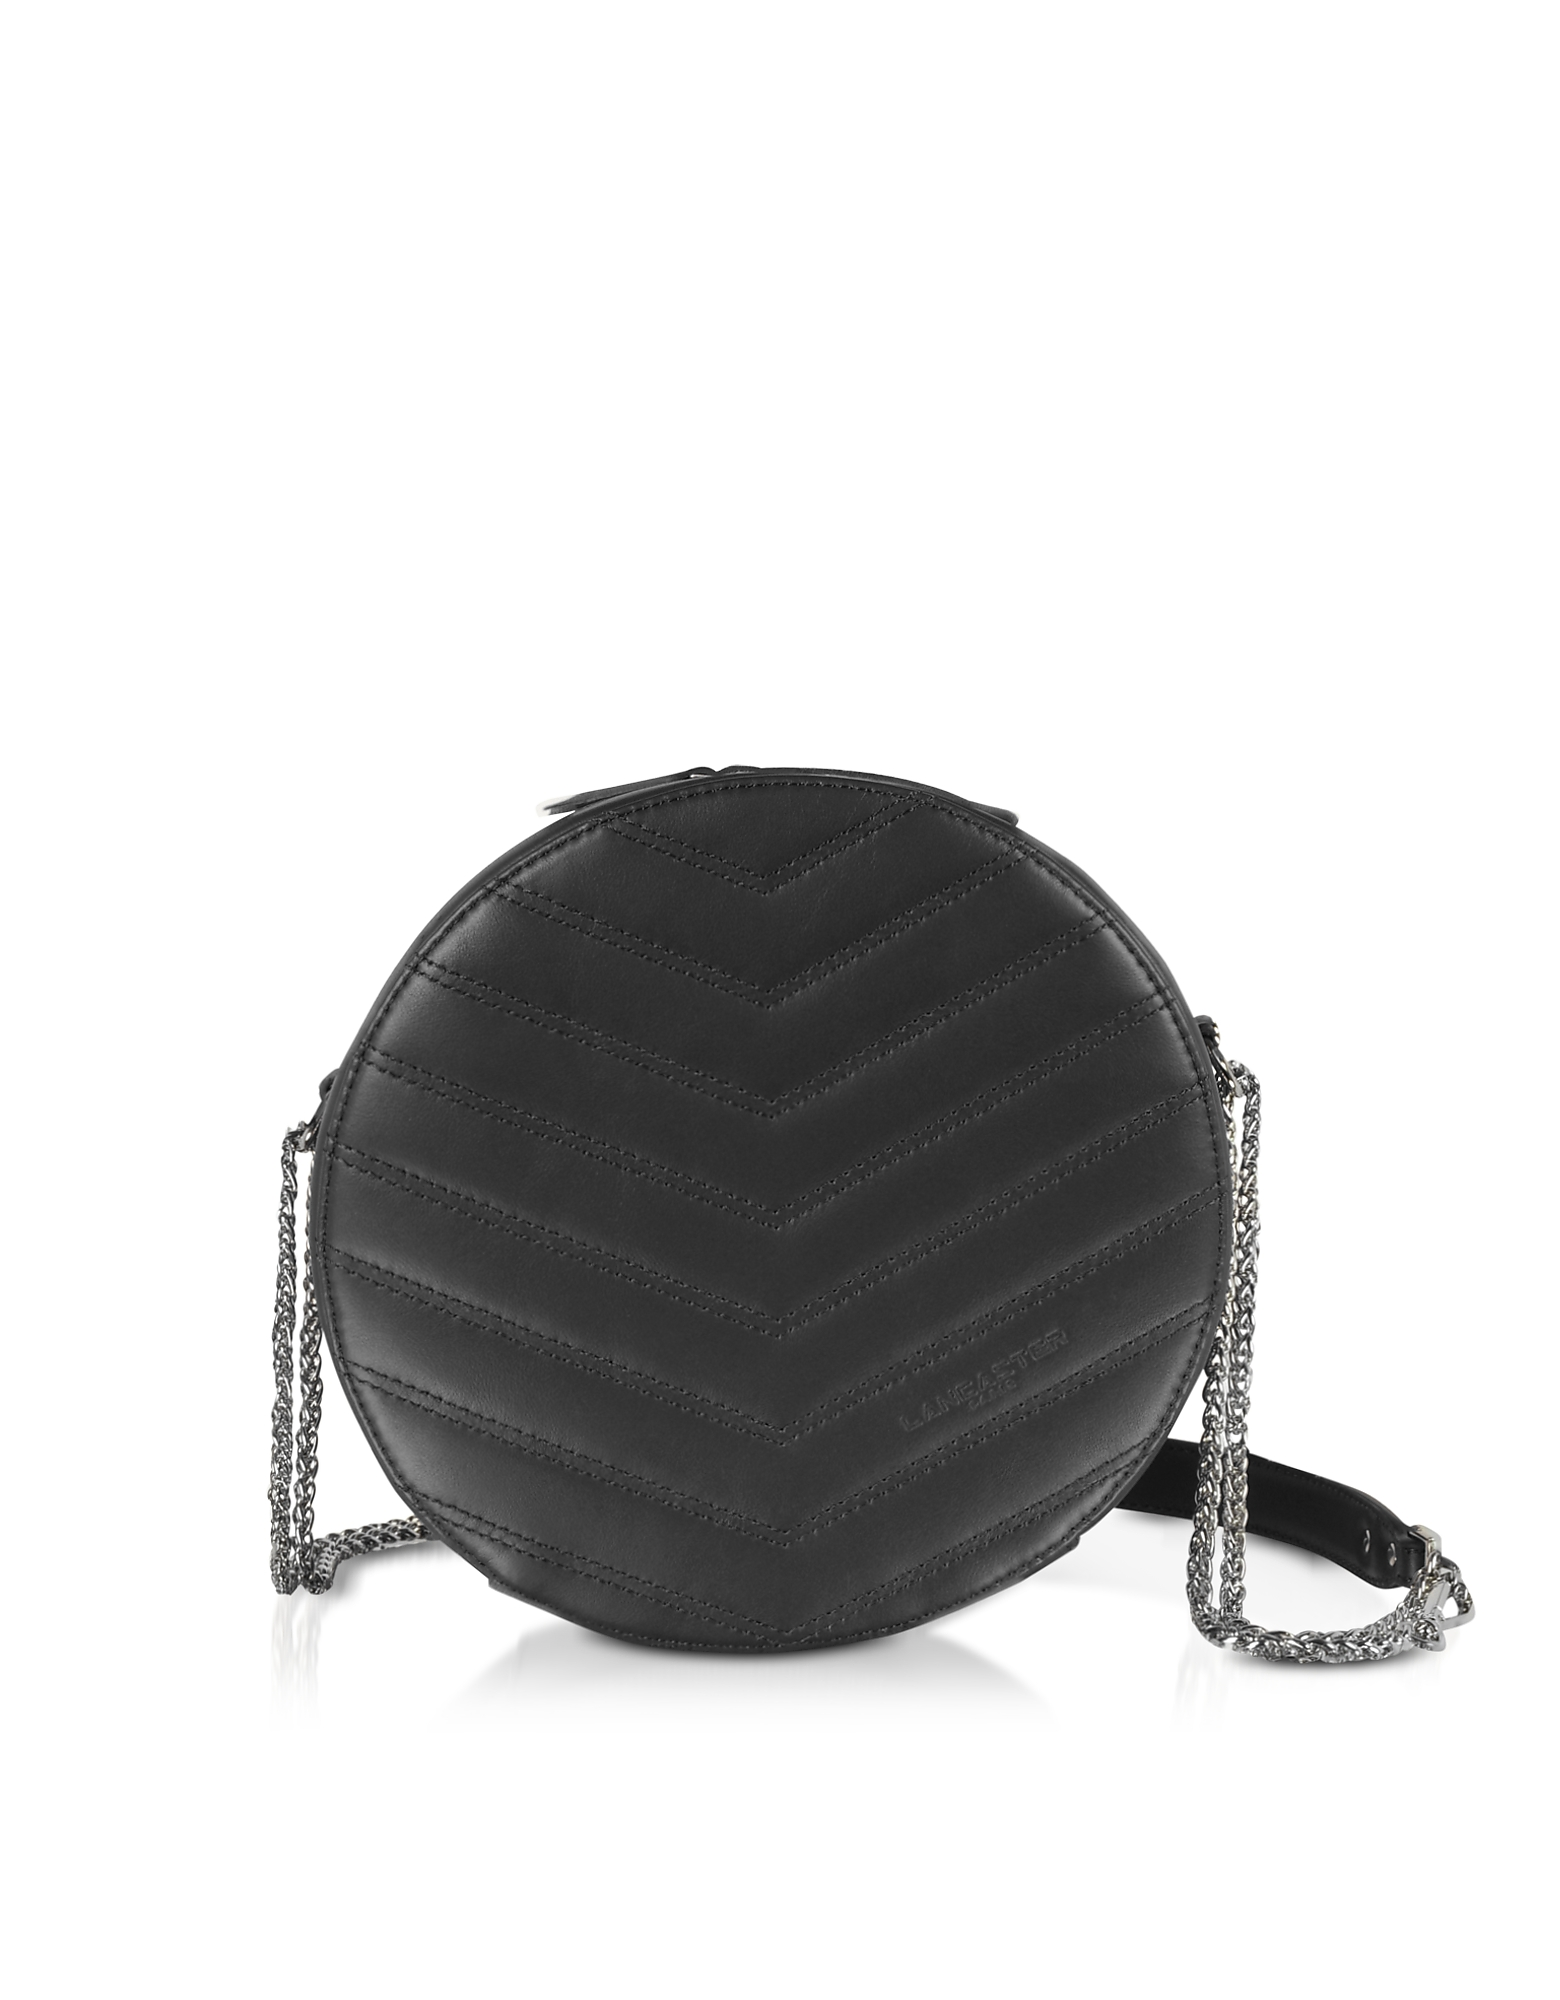 Lancaster Paris Designer Handbags, Parisienne Quilted Leather Round Crossbody Bag